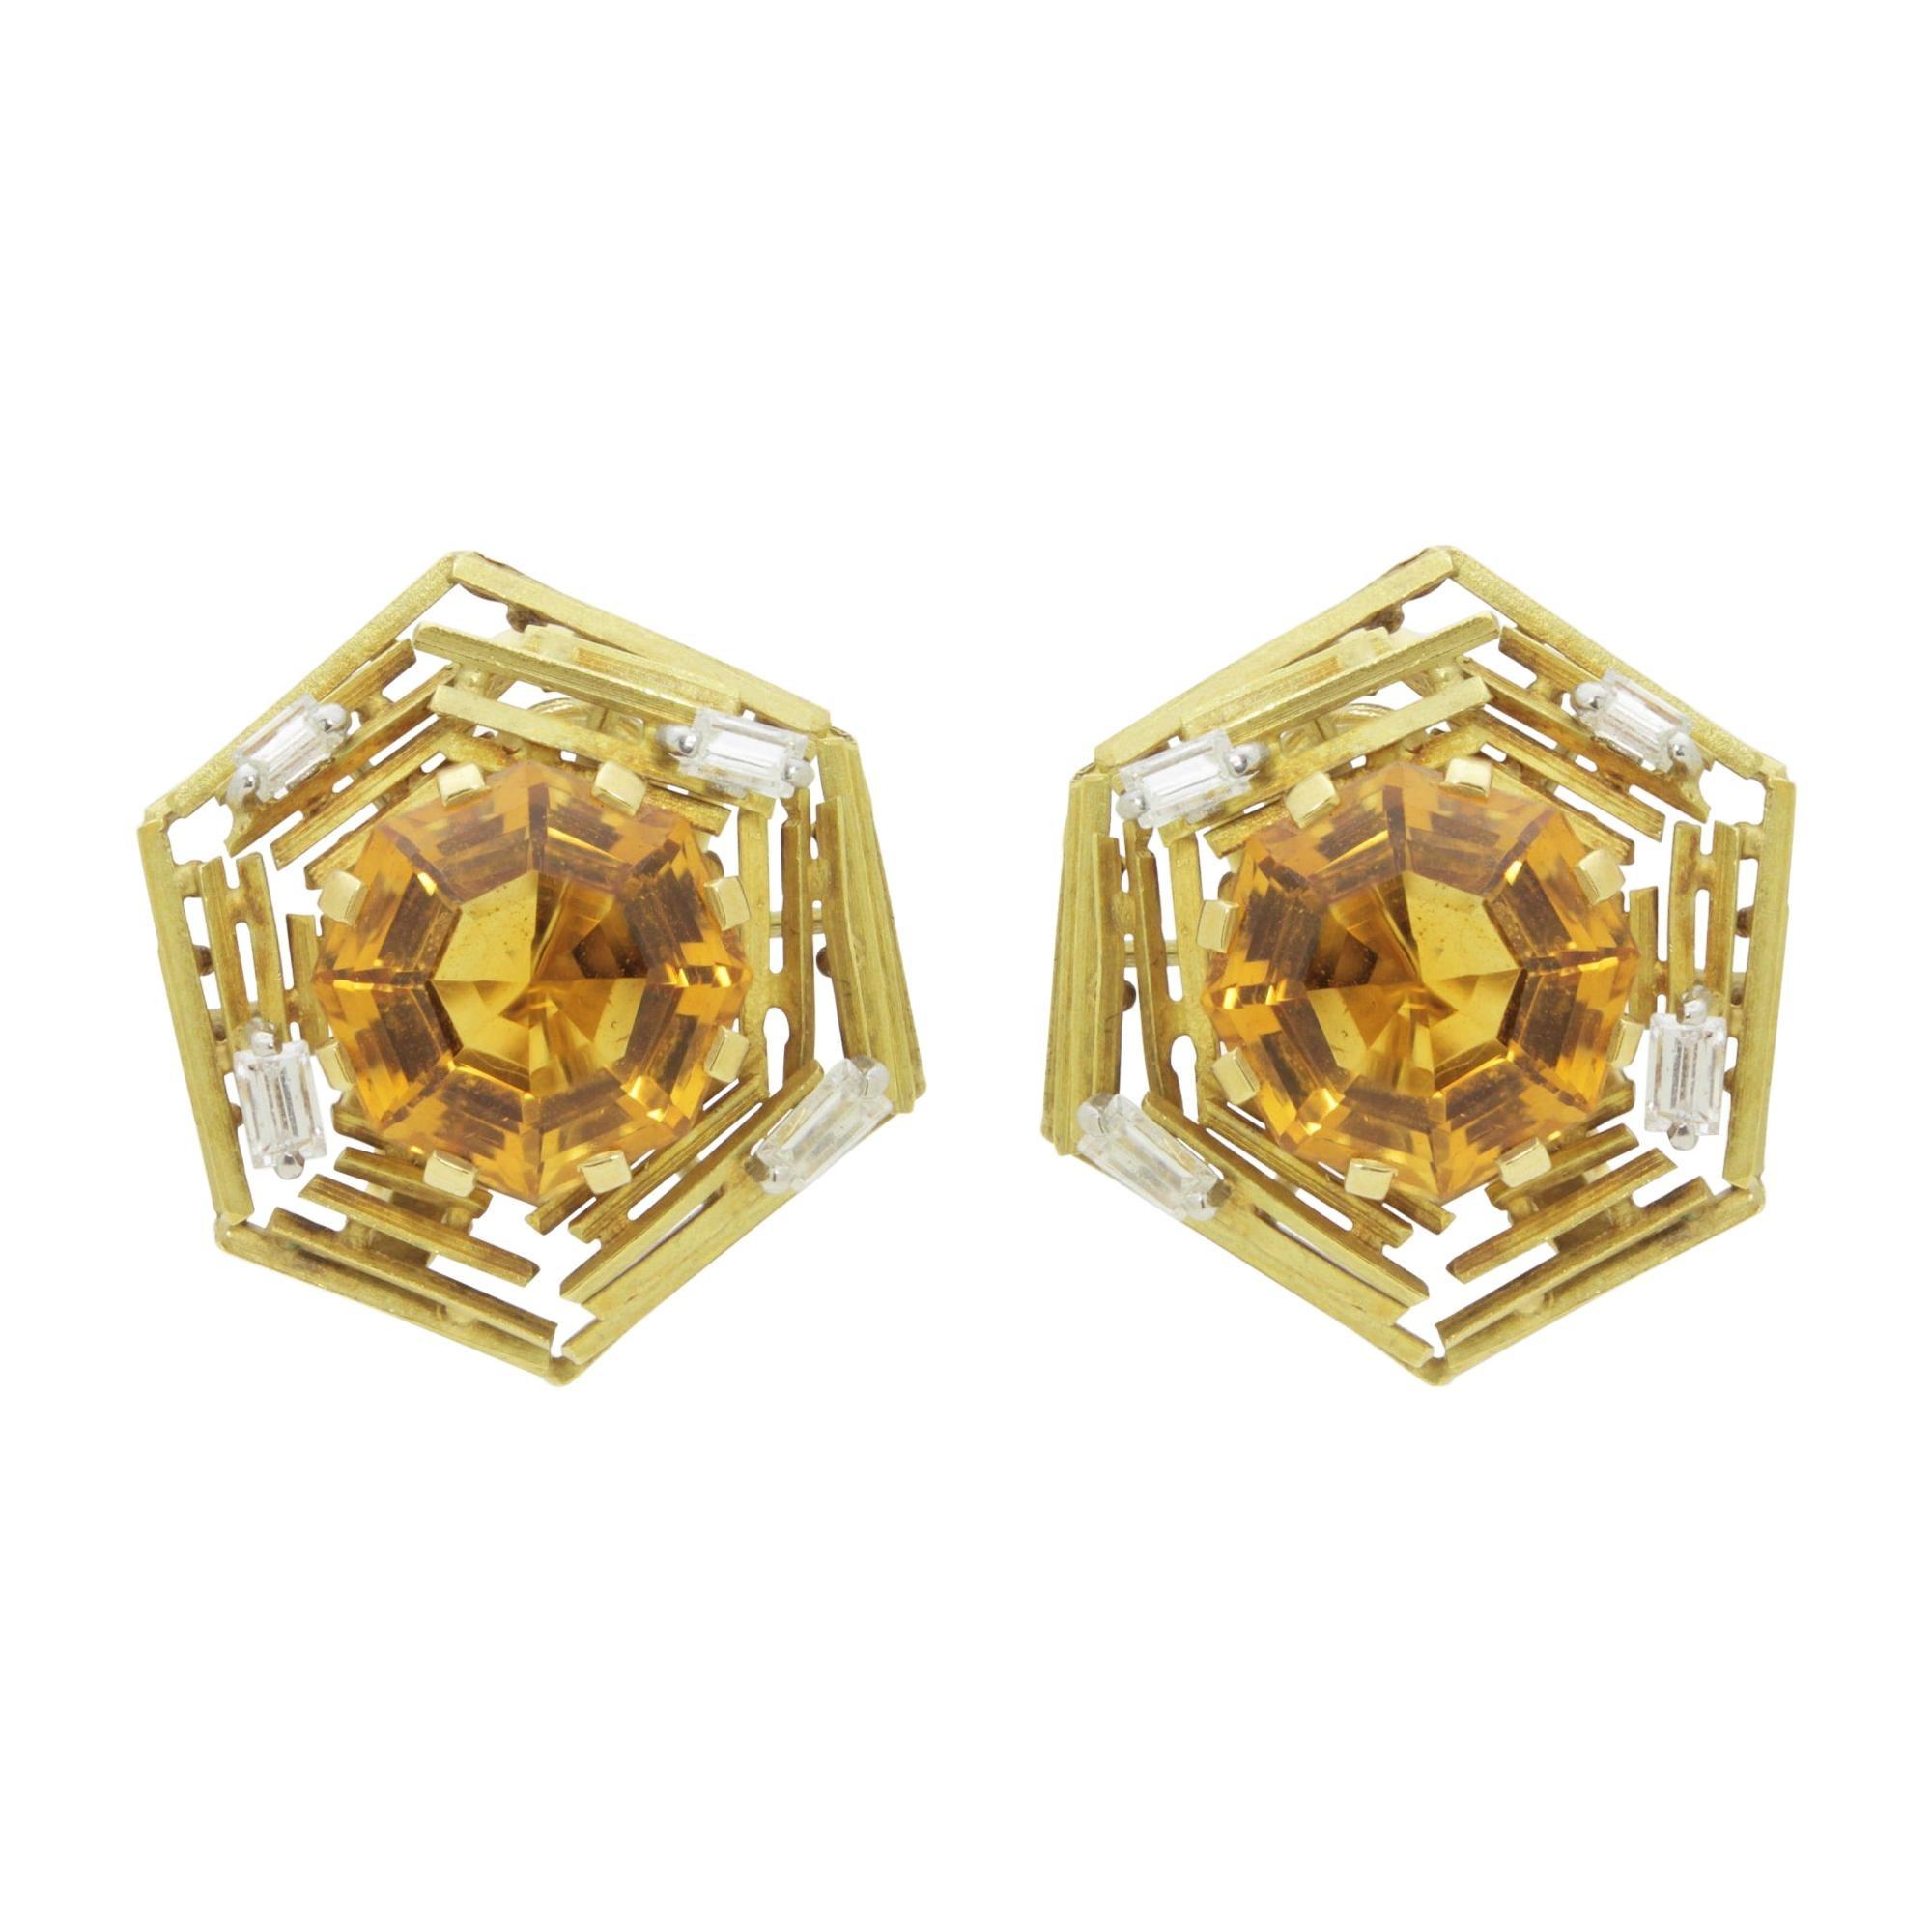 Andrew Grima 18 Karat Gold, Citrine and Diamond Ear Clips